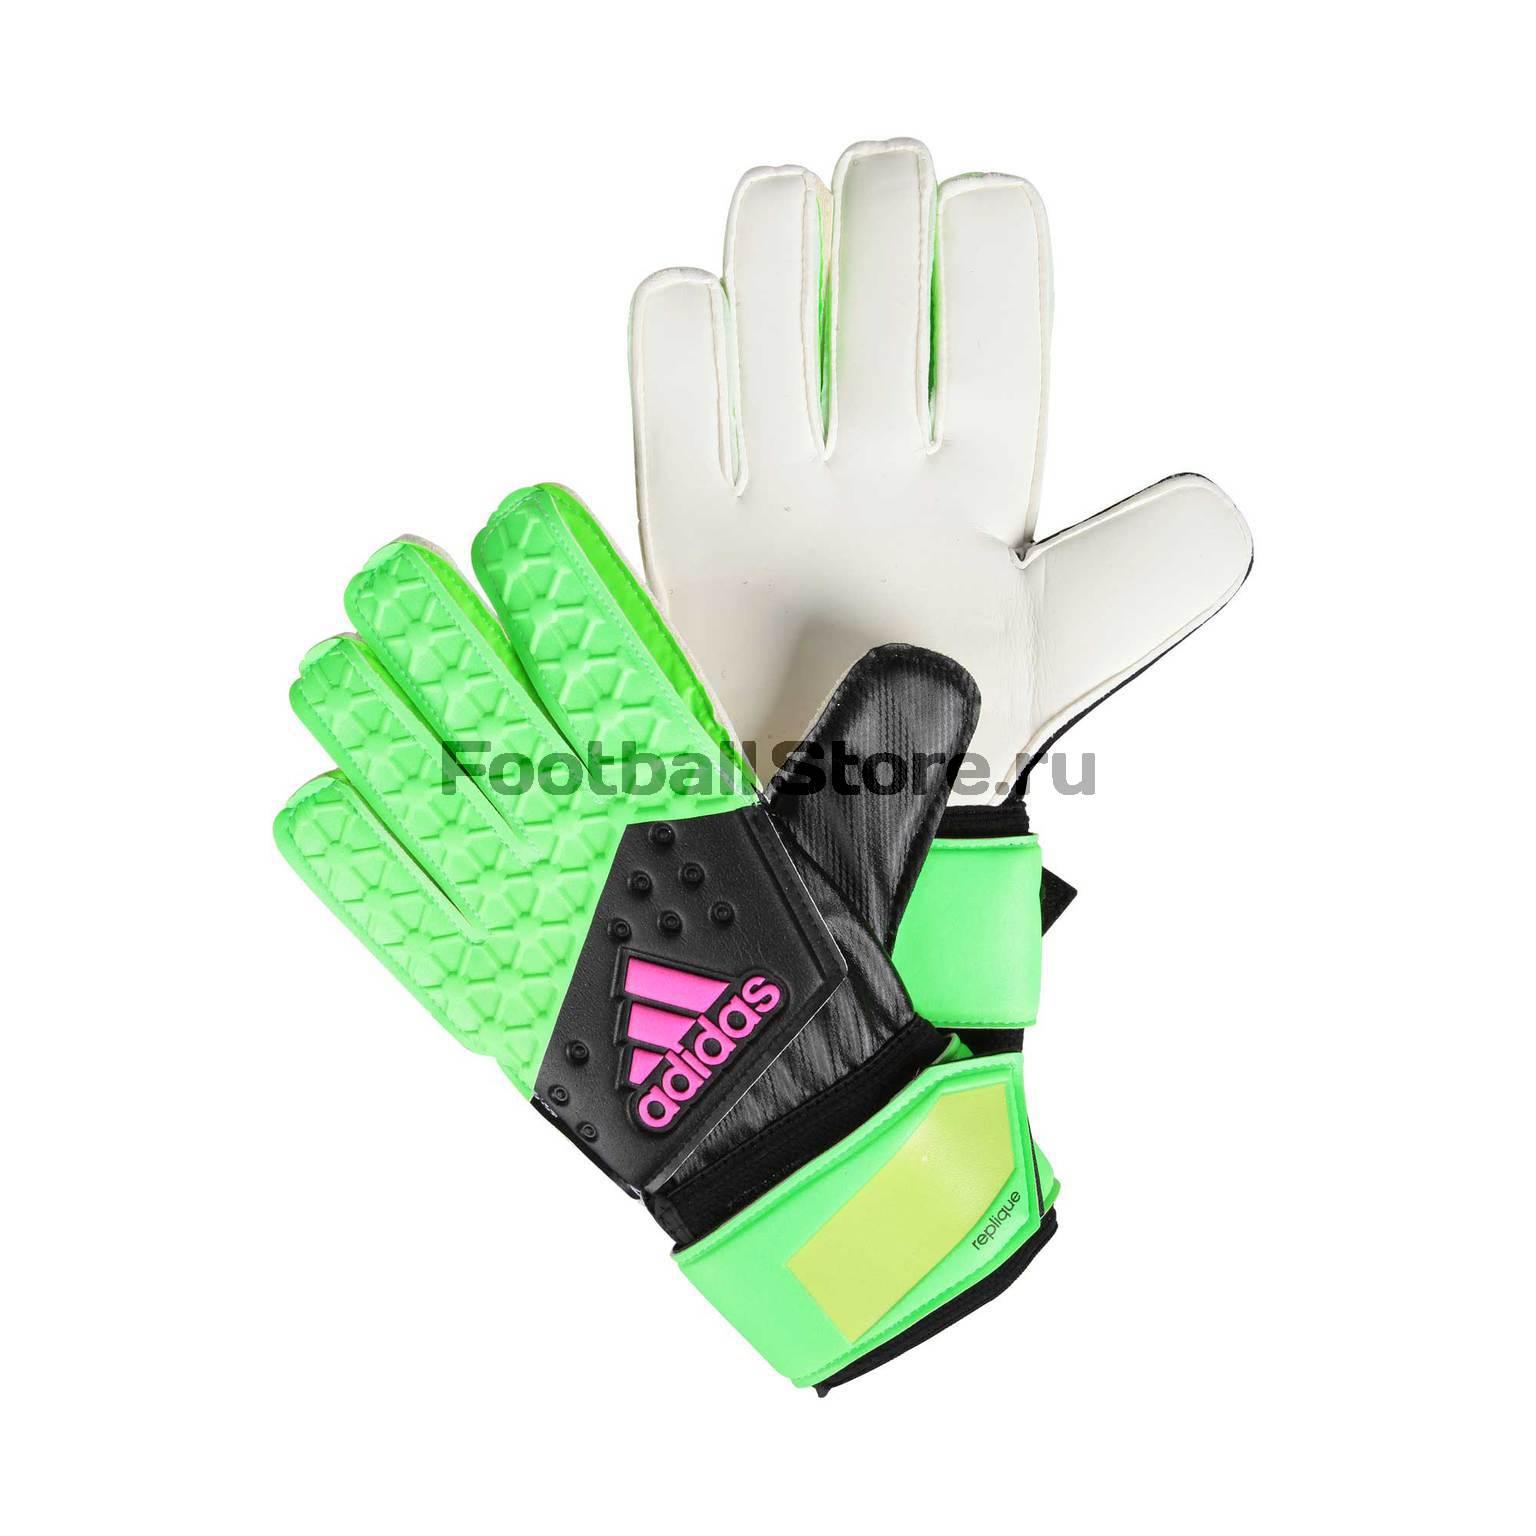 Перчатки вратарские Adidas ACE Replique AH7811 перчатки adidas перчатки вратарские adidas ace magnetic st cd9131